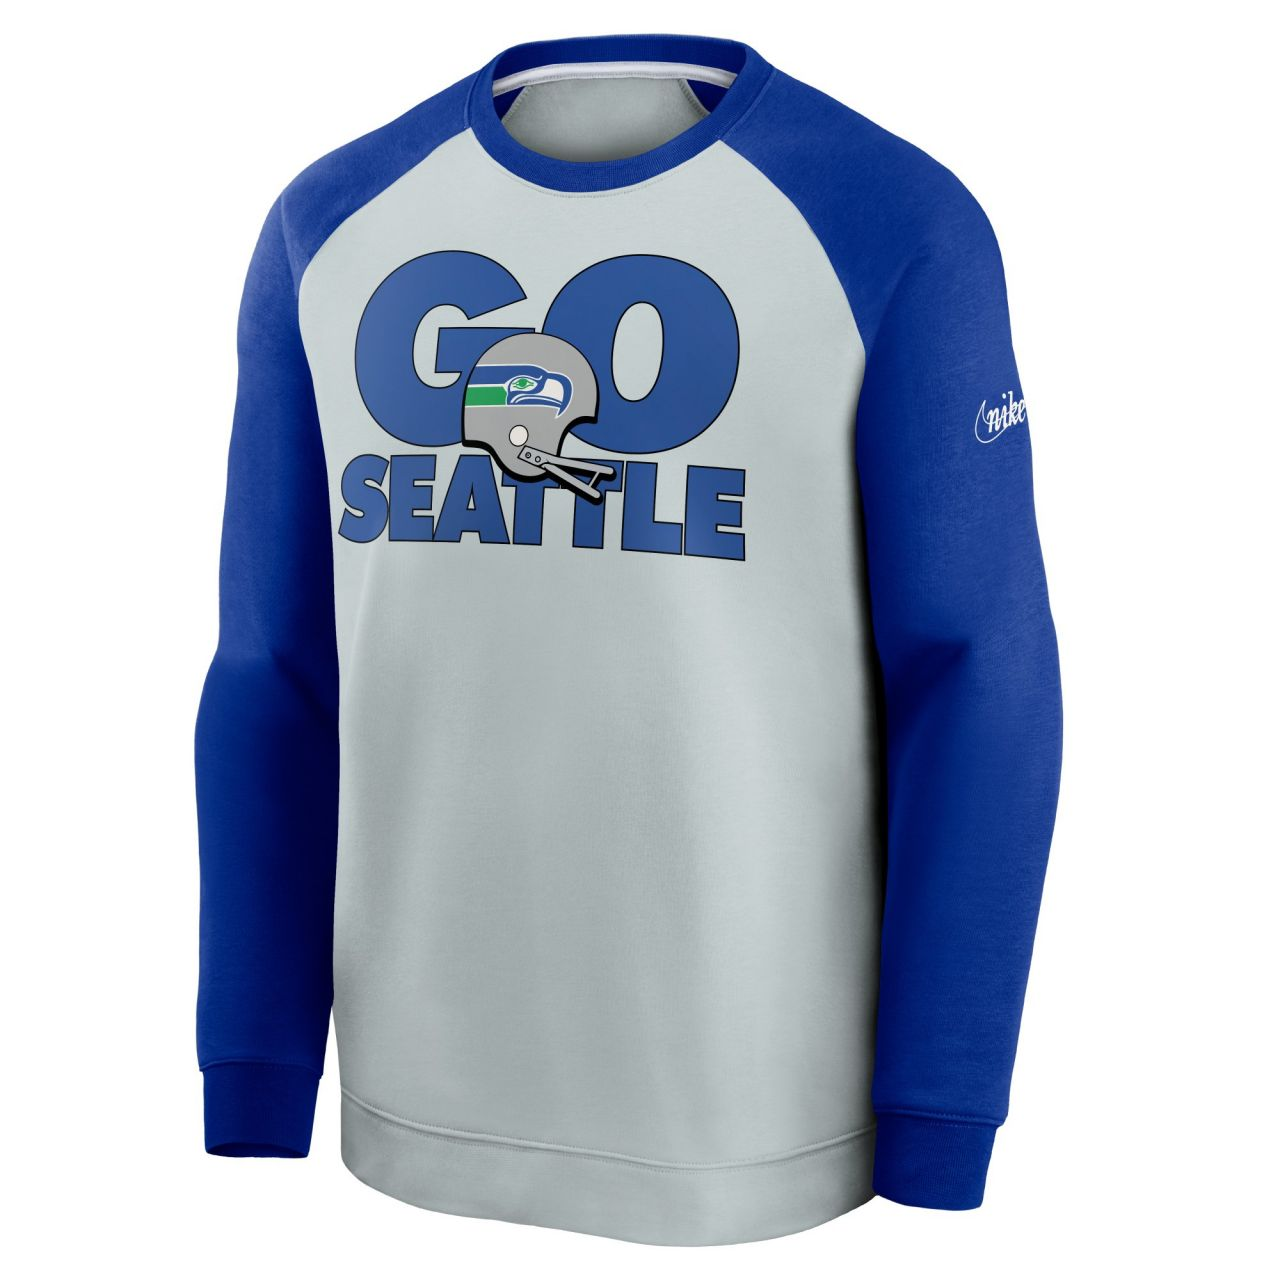 amfoo - Nike NFL Throwback Pullover - Seattle Seahawks 1983-1990